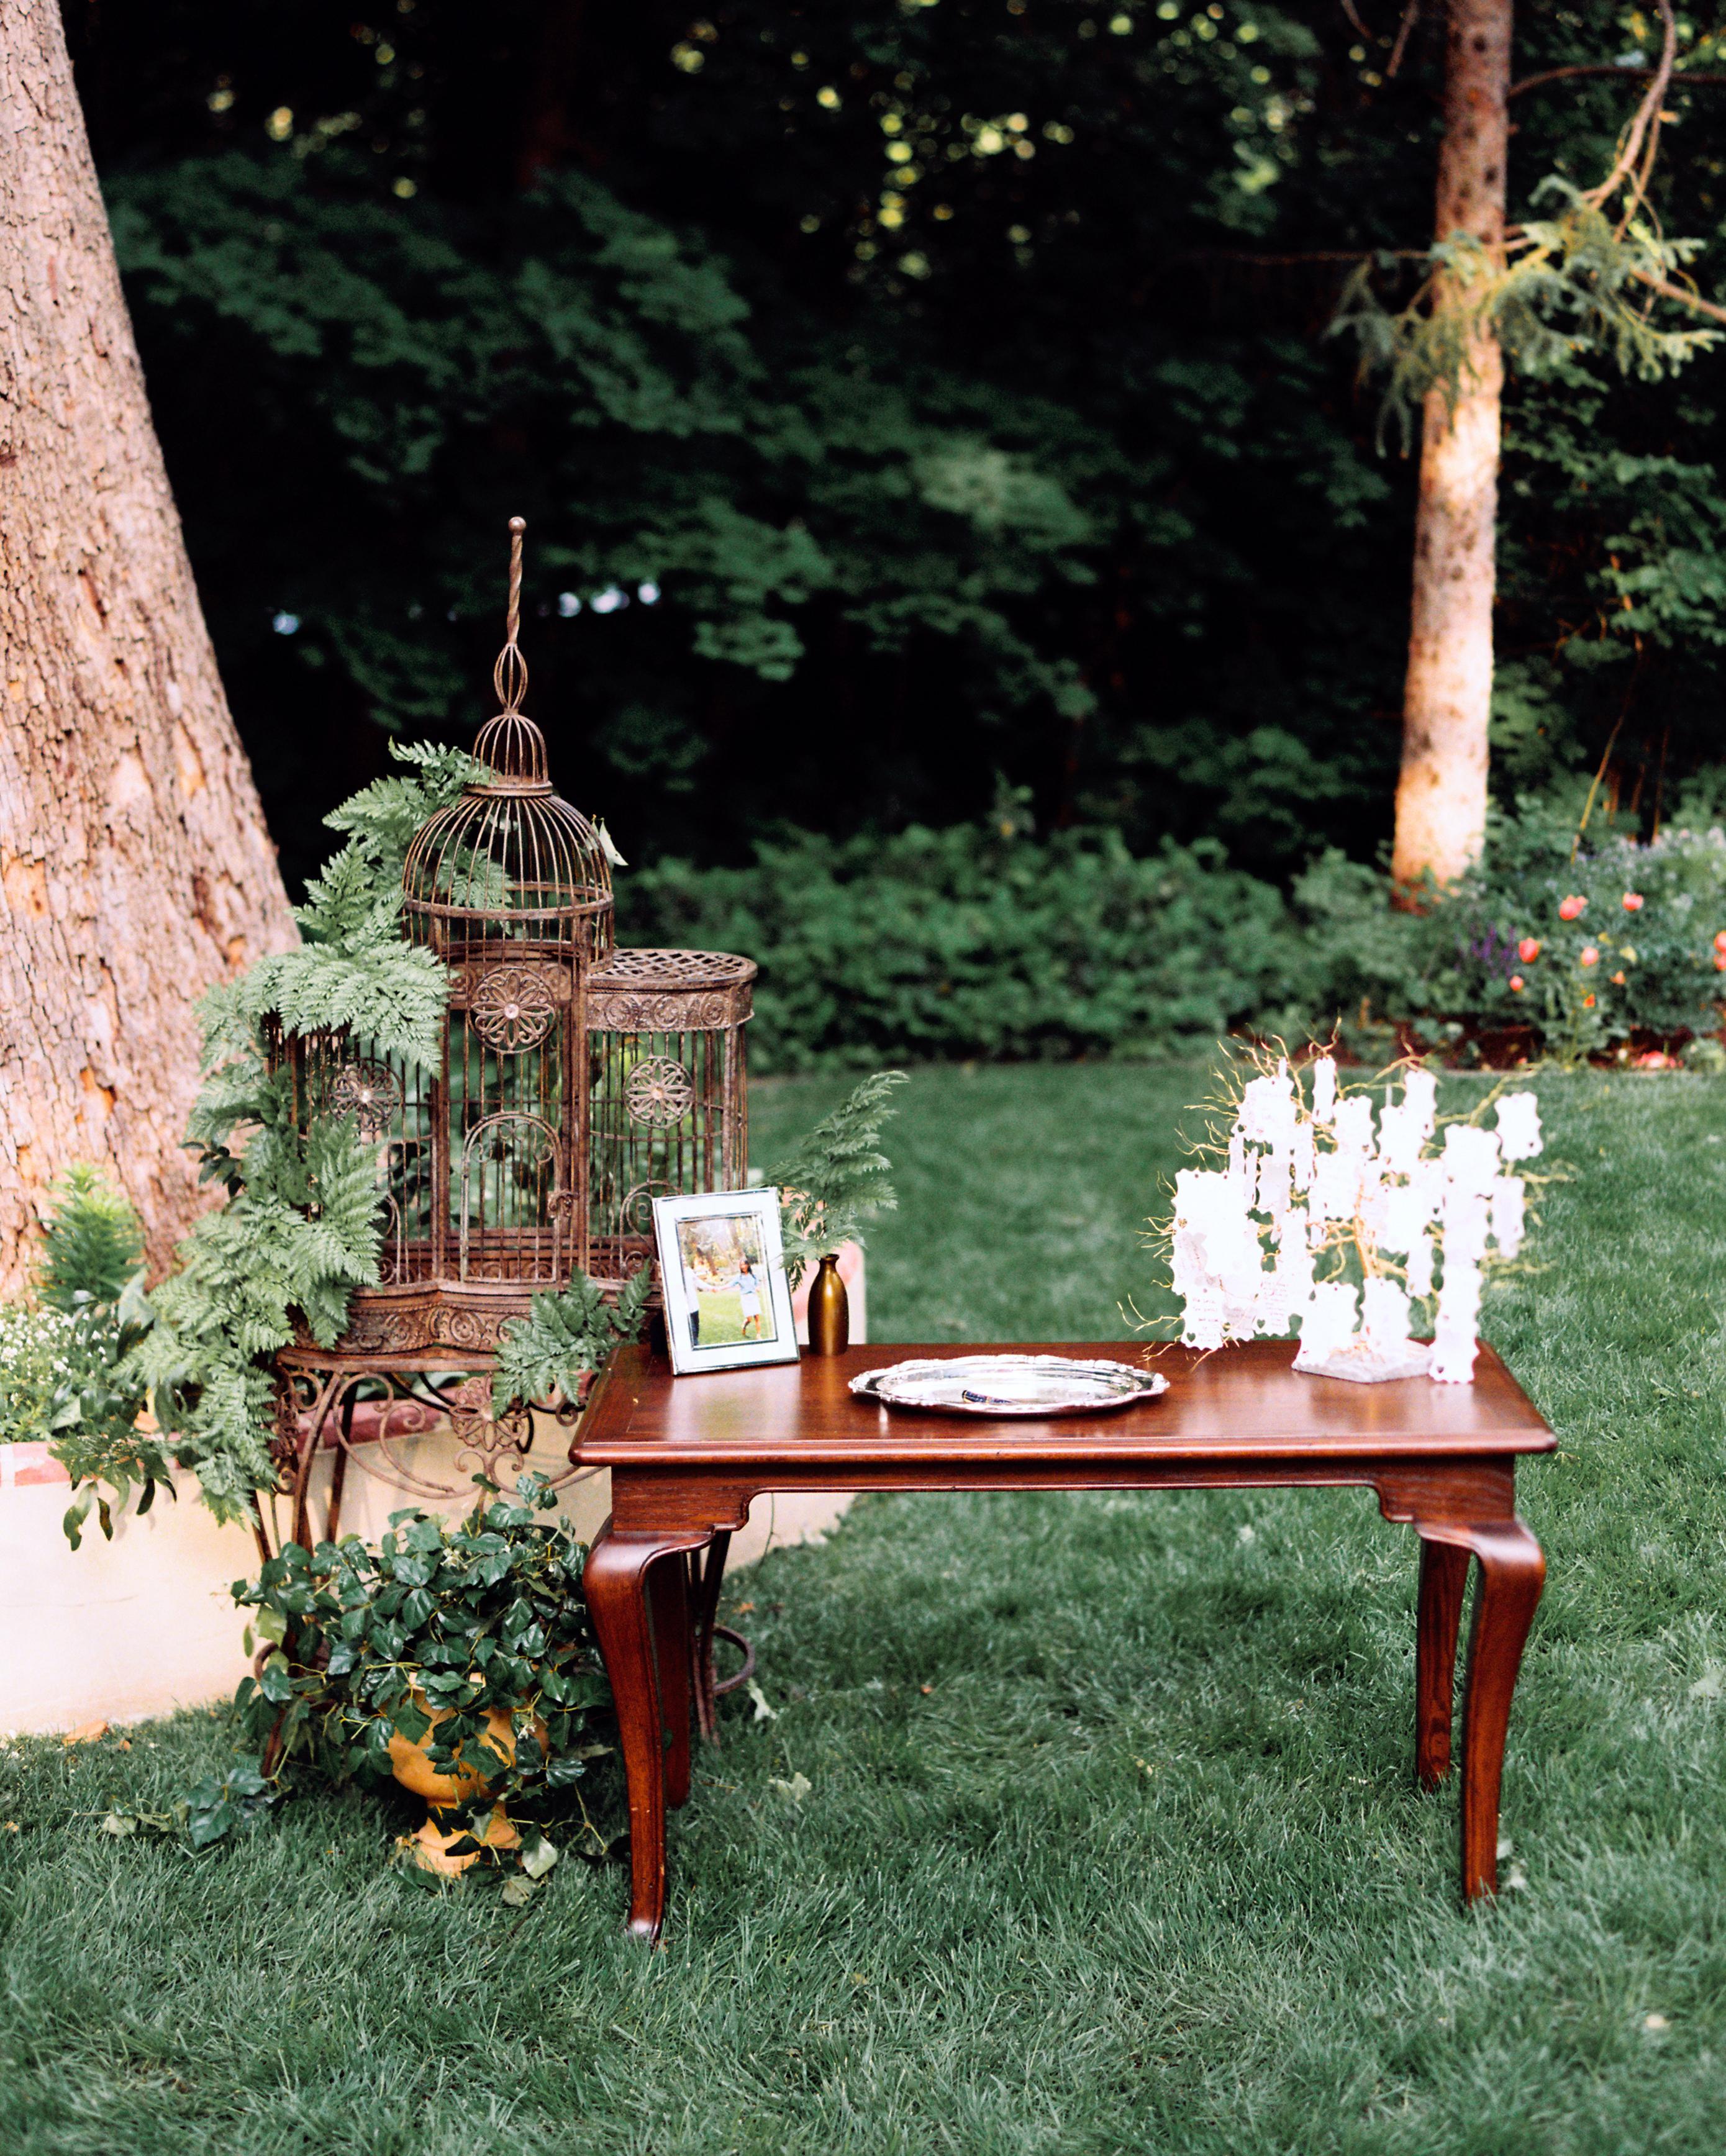 ally-adam-wedding-table-052-s111818-0215.jpg